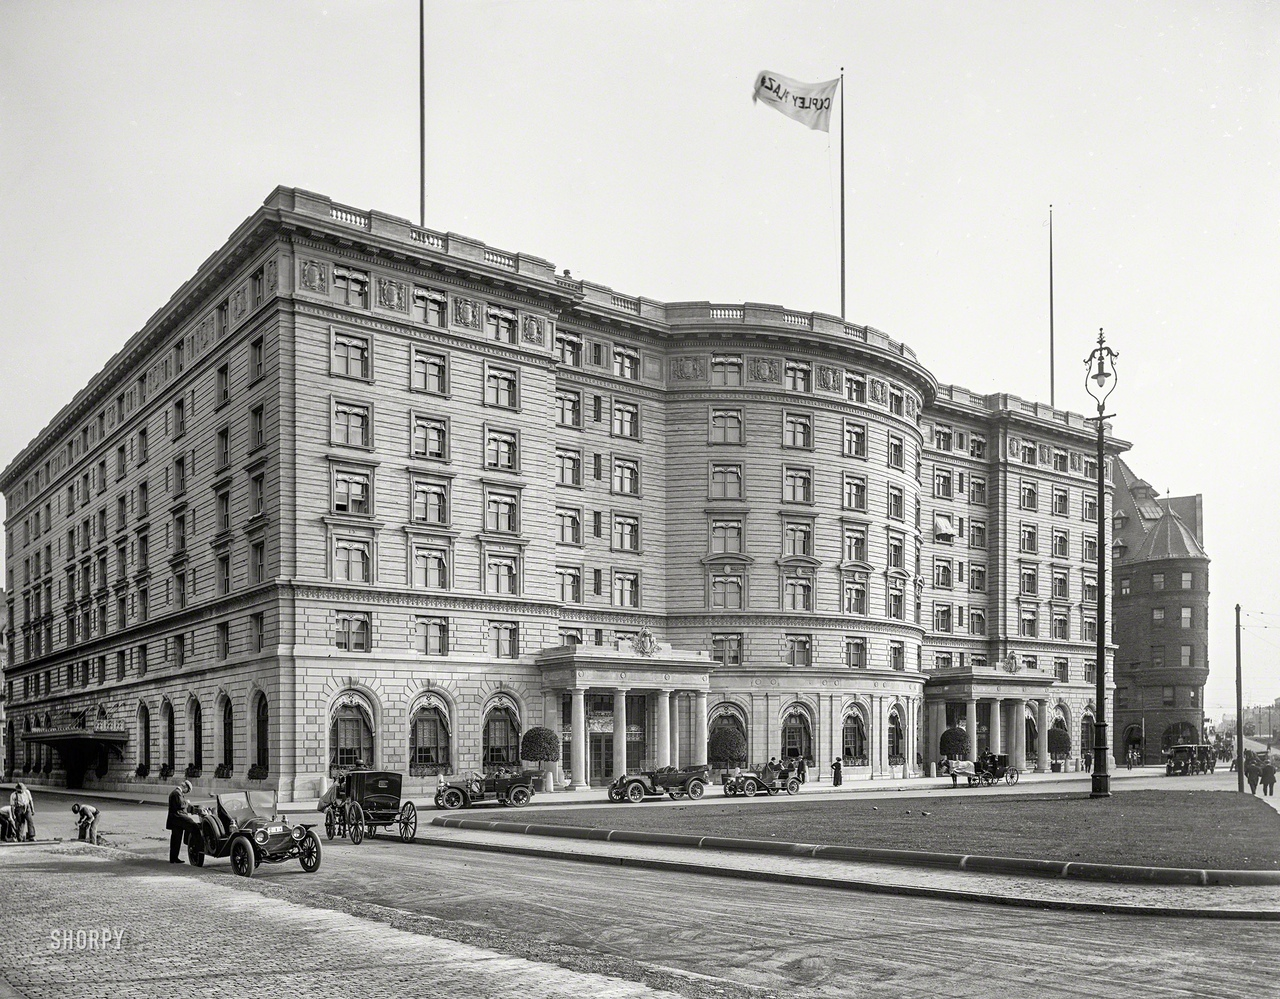 Copley Plaza Hotel на площади Копли, Бостон, штат Массачусетс, 1912.